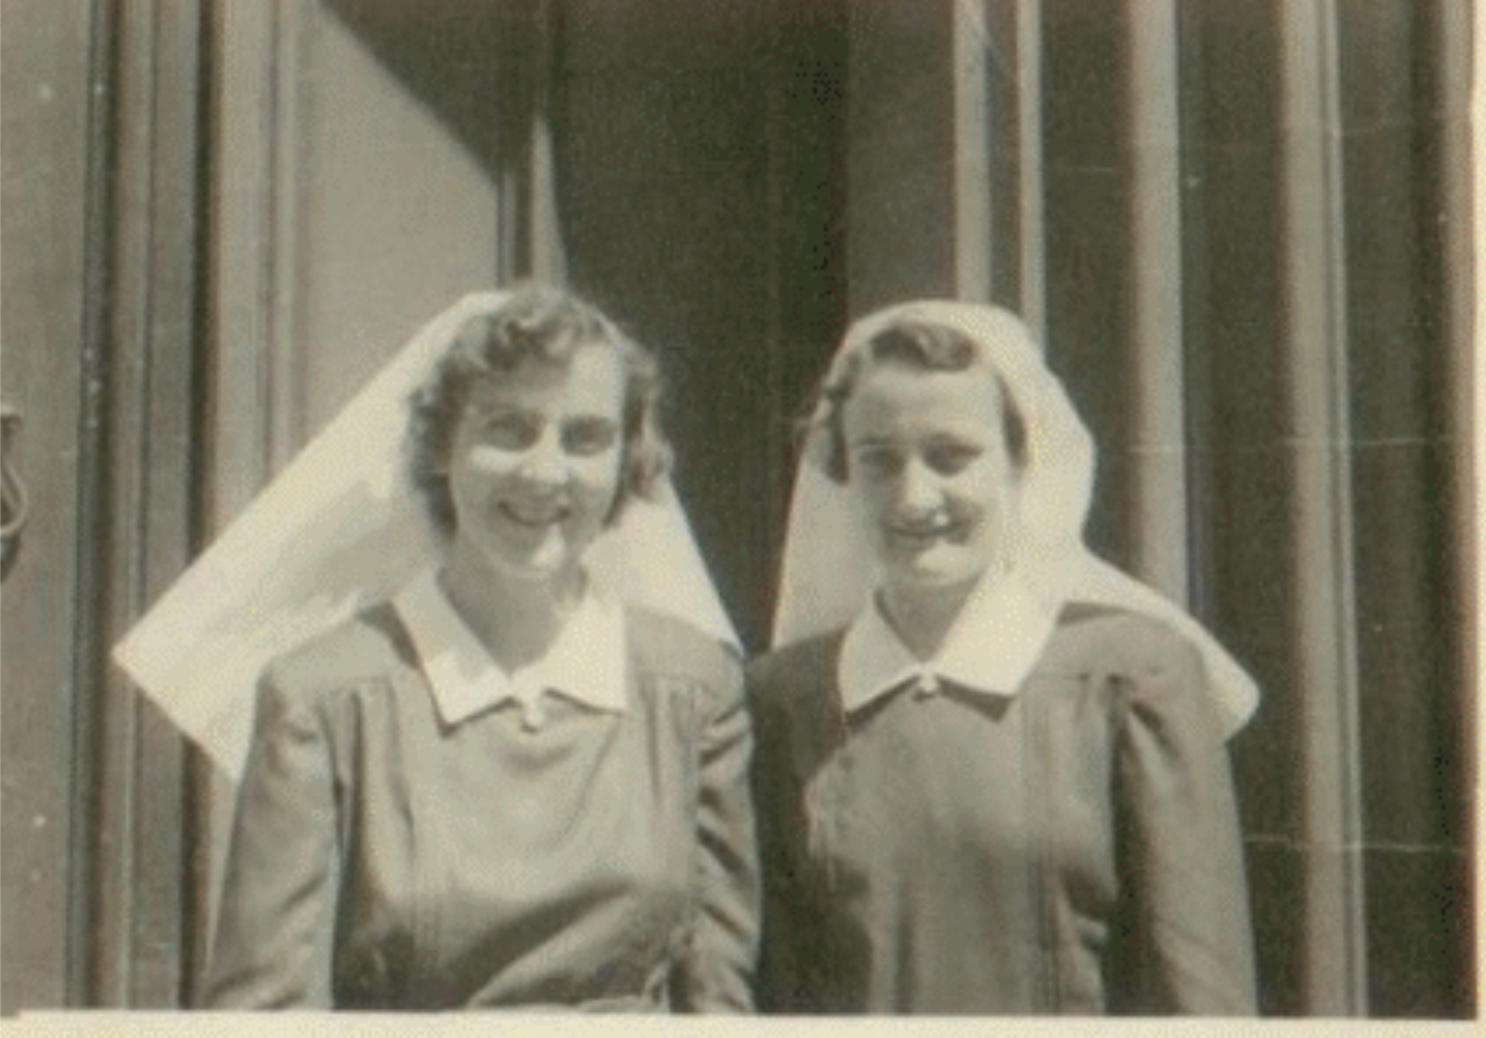 Jean Standfield (right)